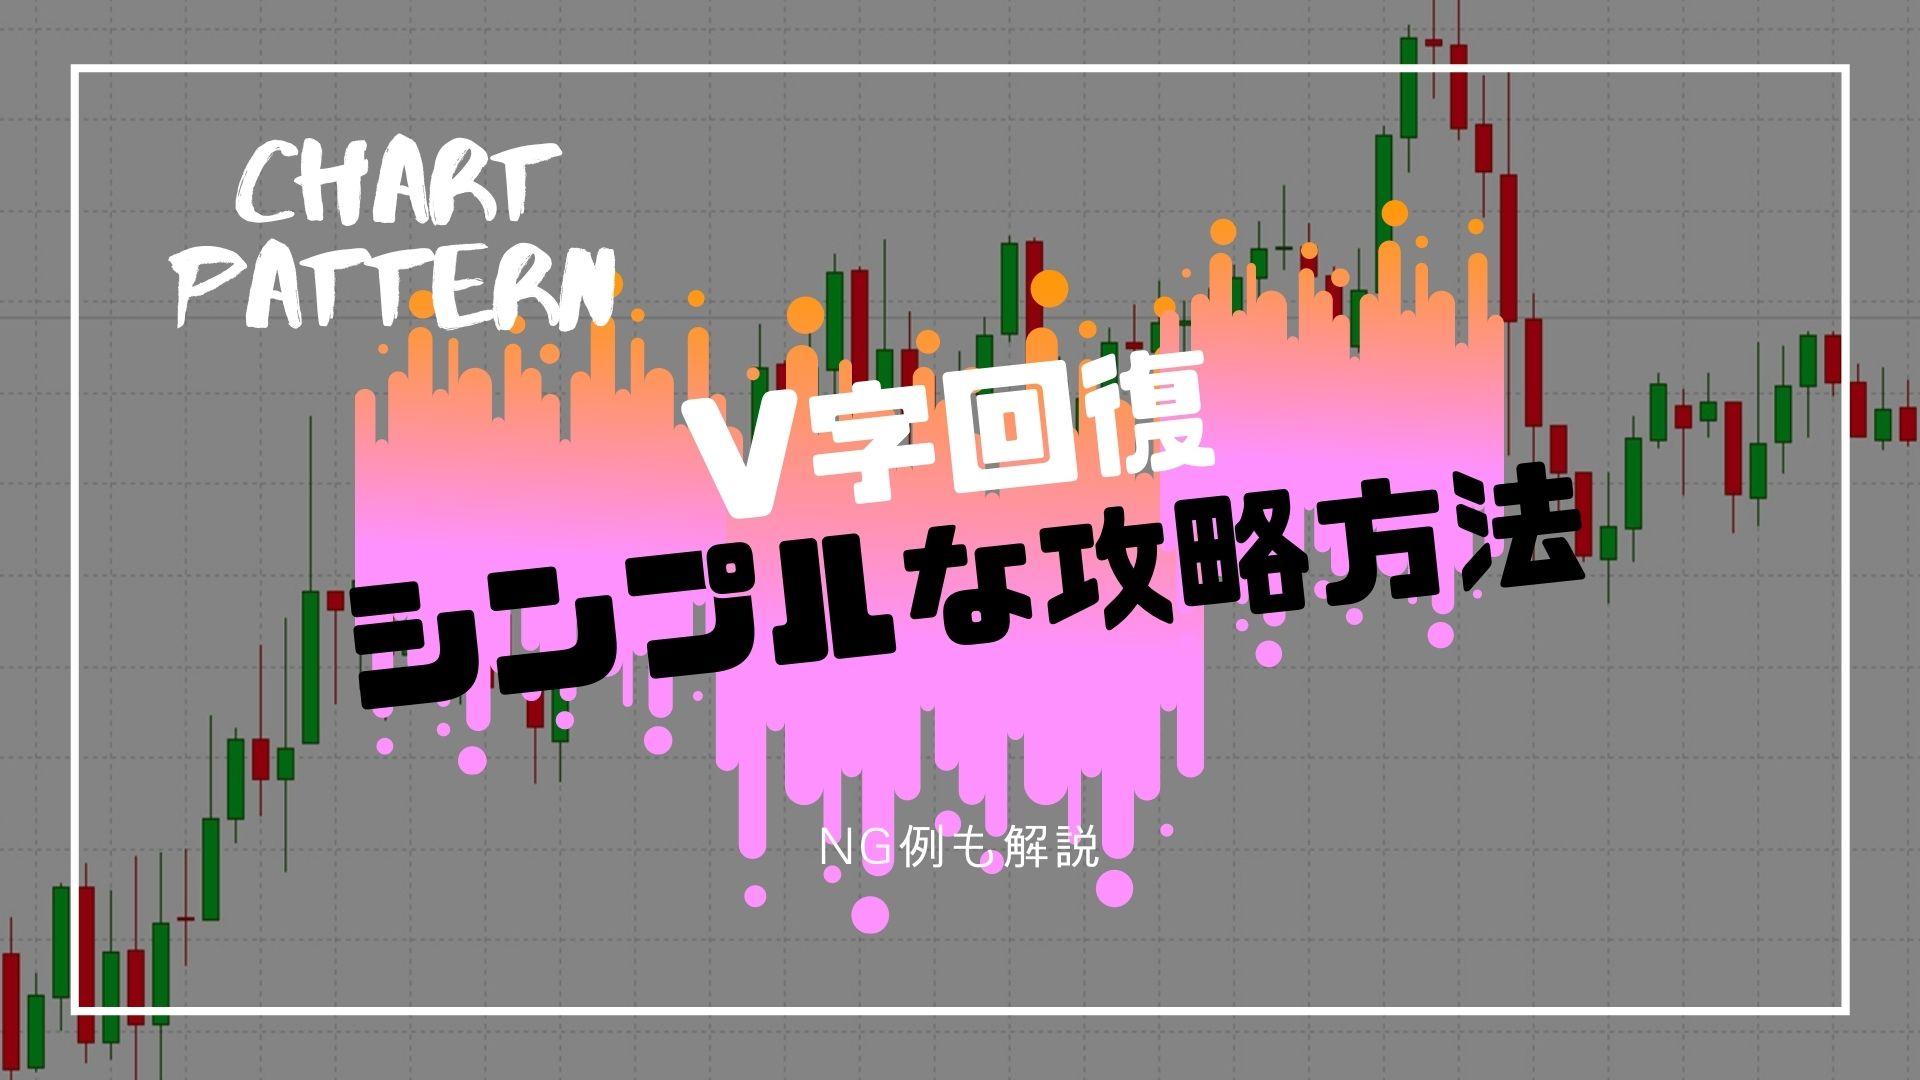 v-reversal-pattern-title